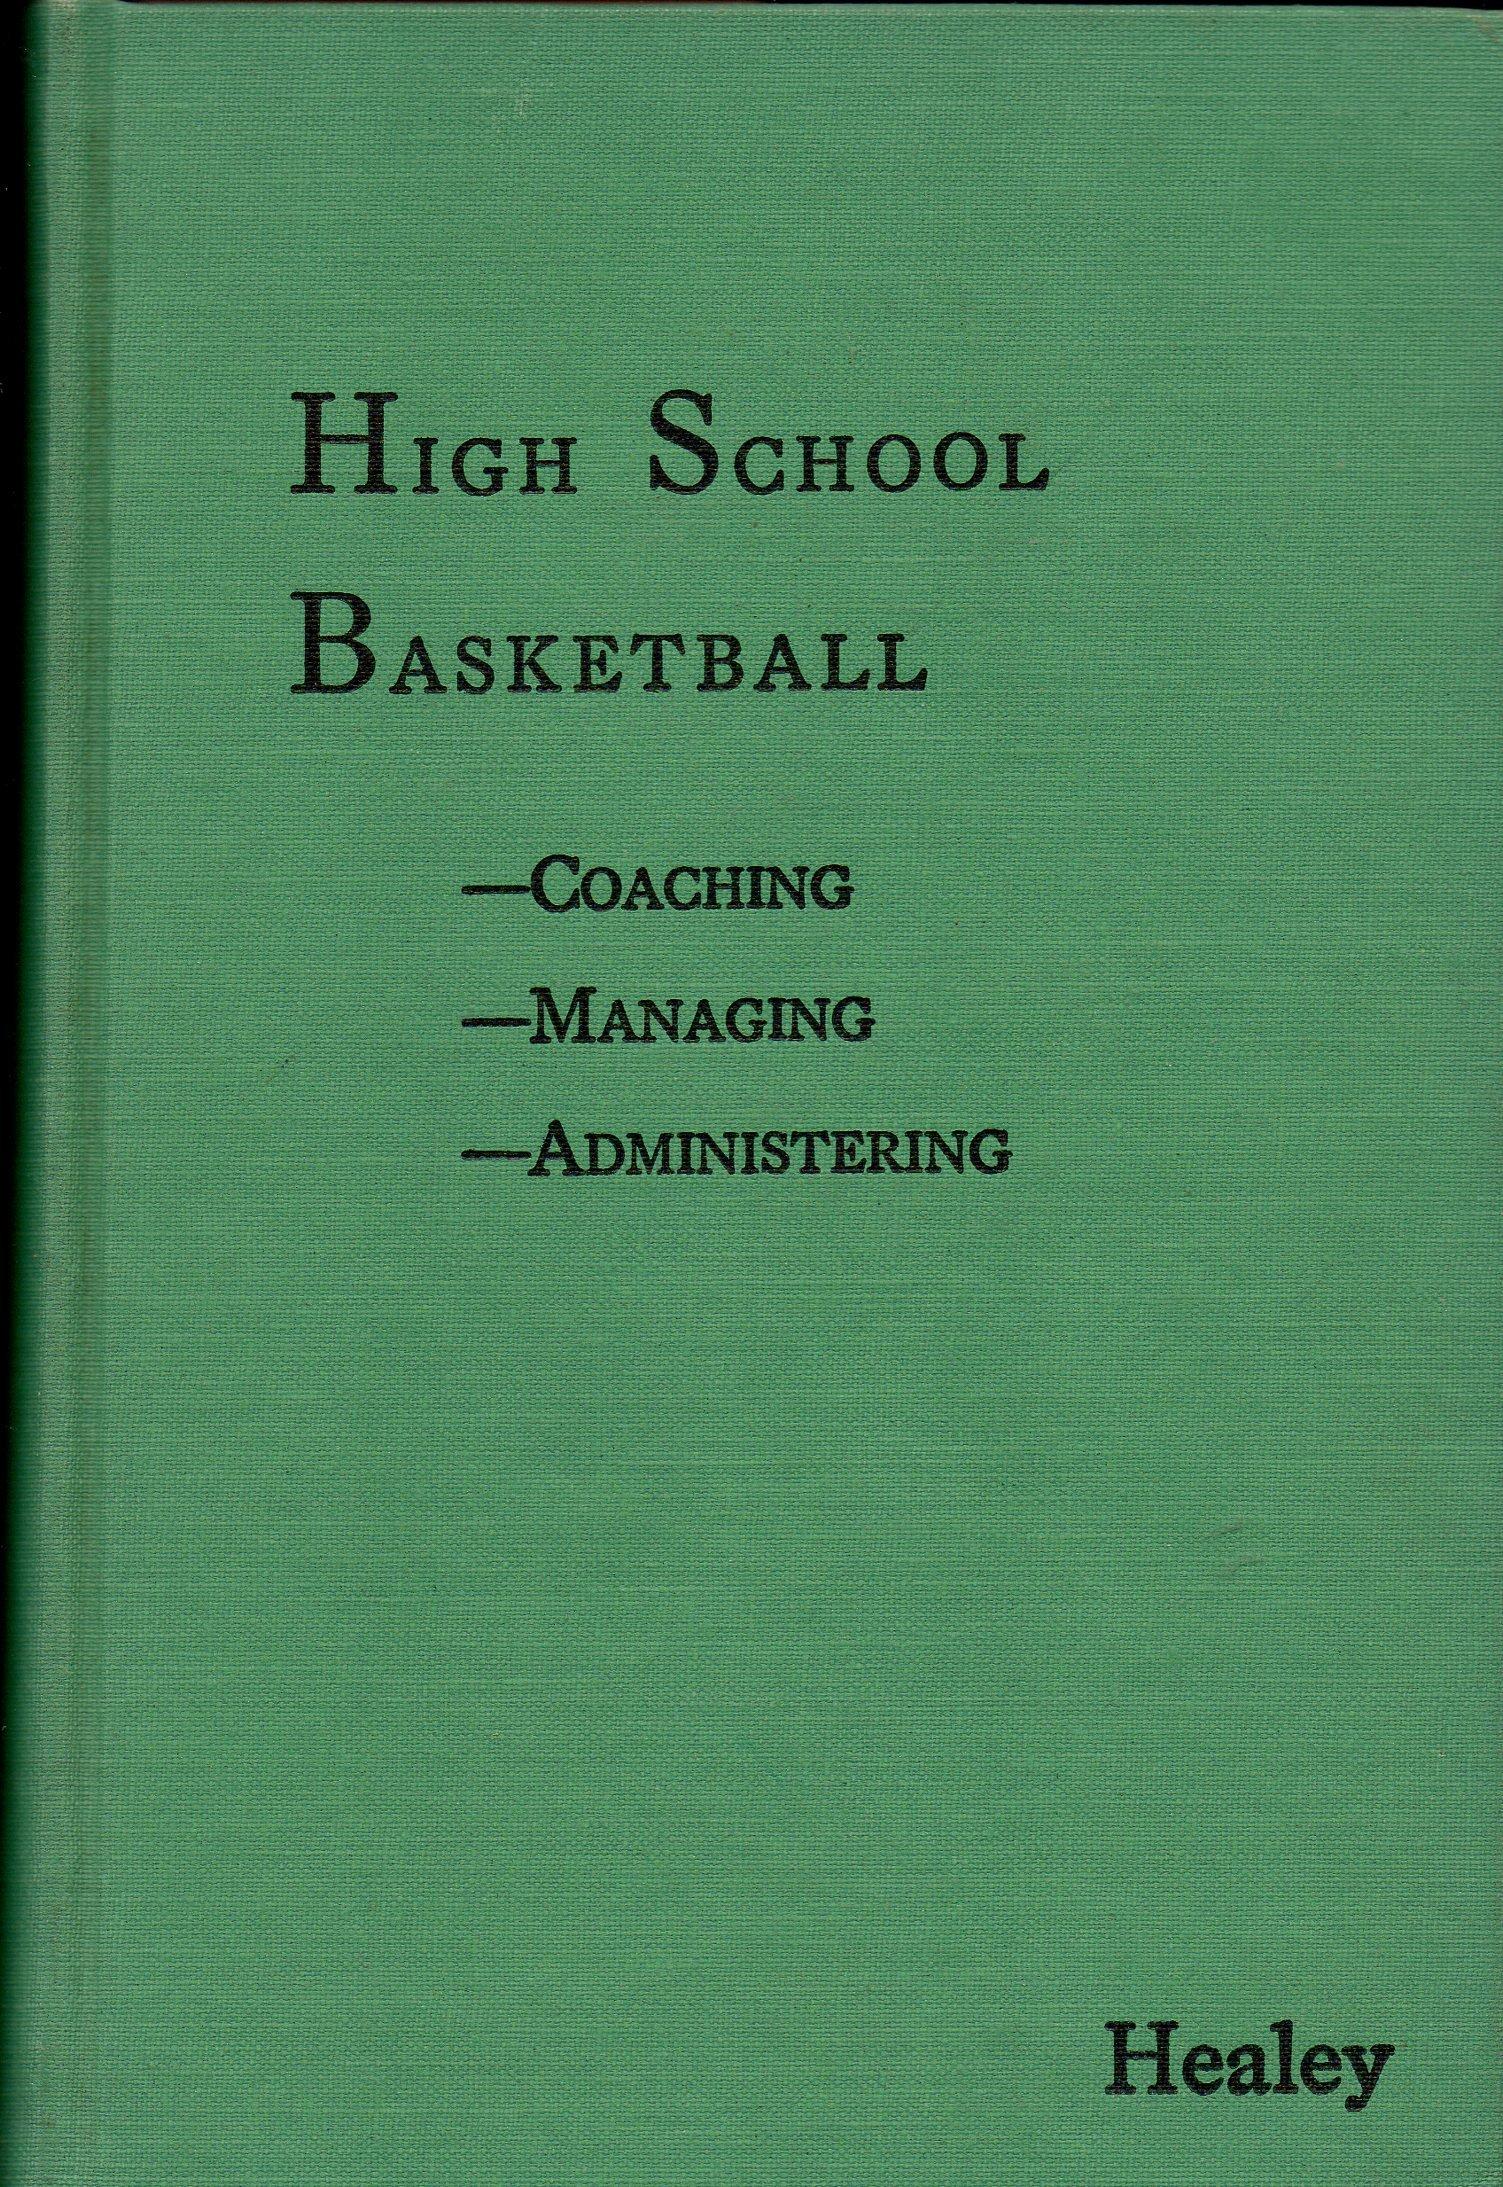 high-school-basketball-coaching-managing-administering